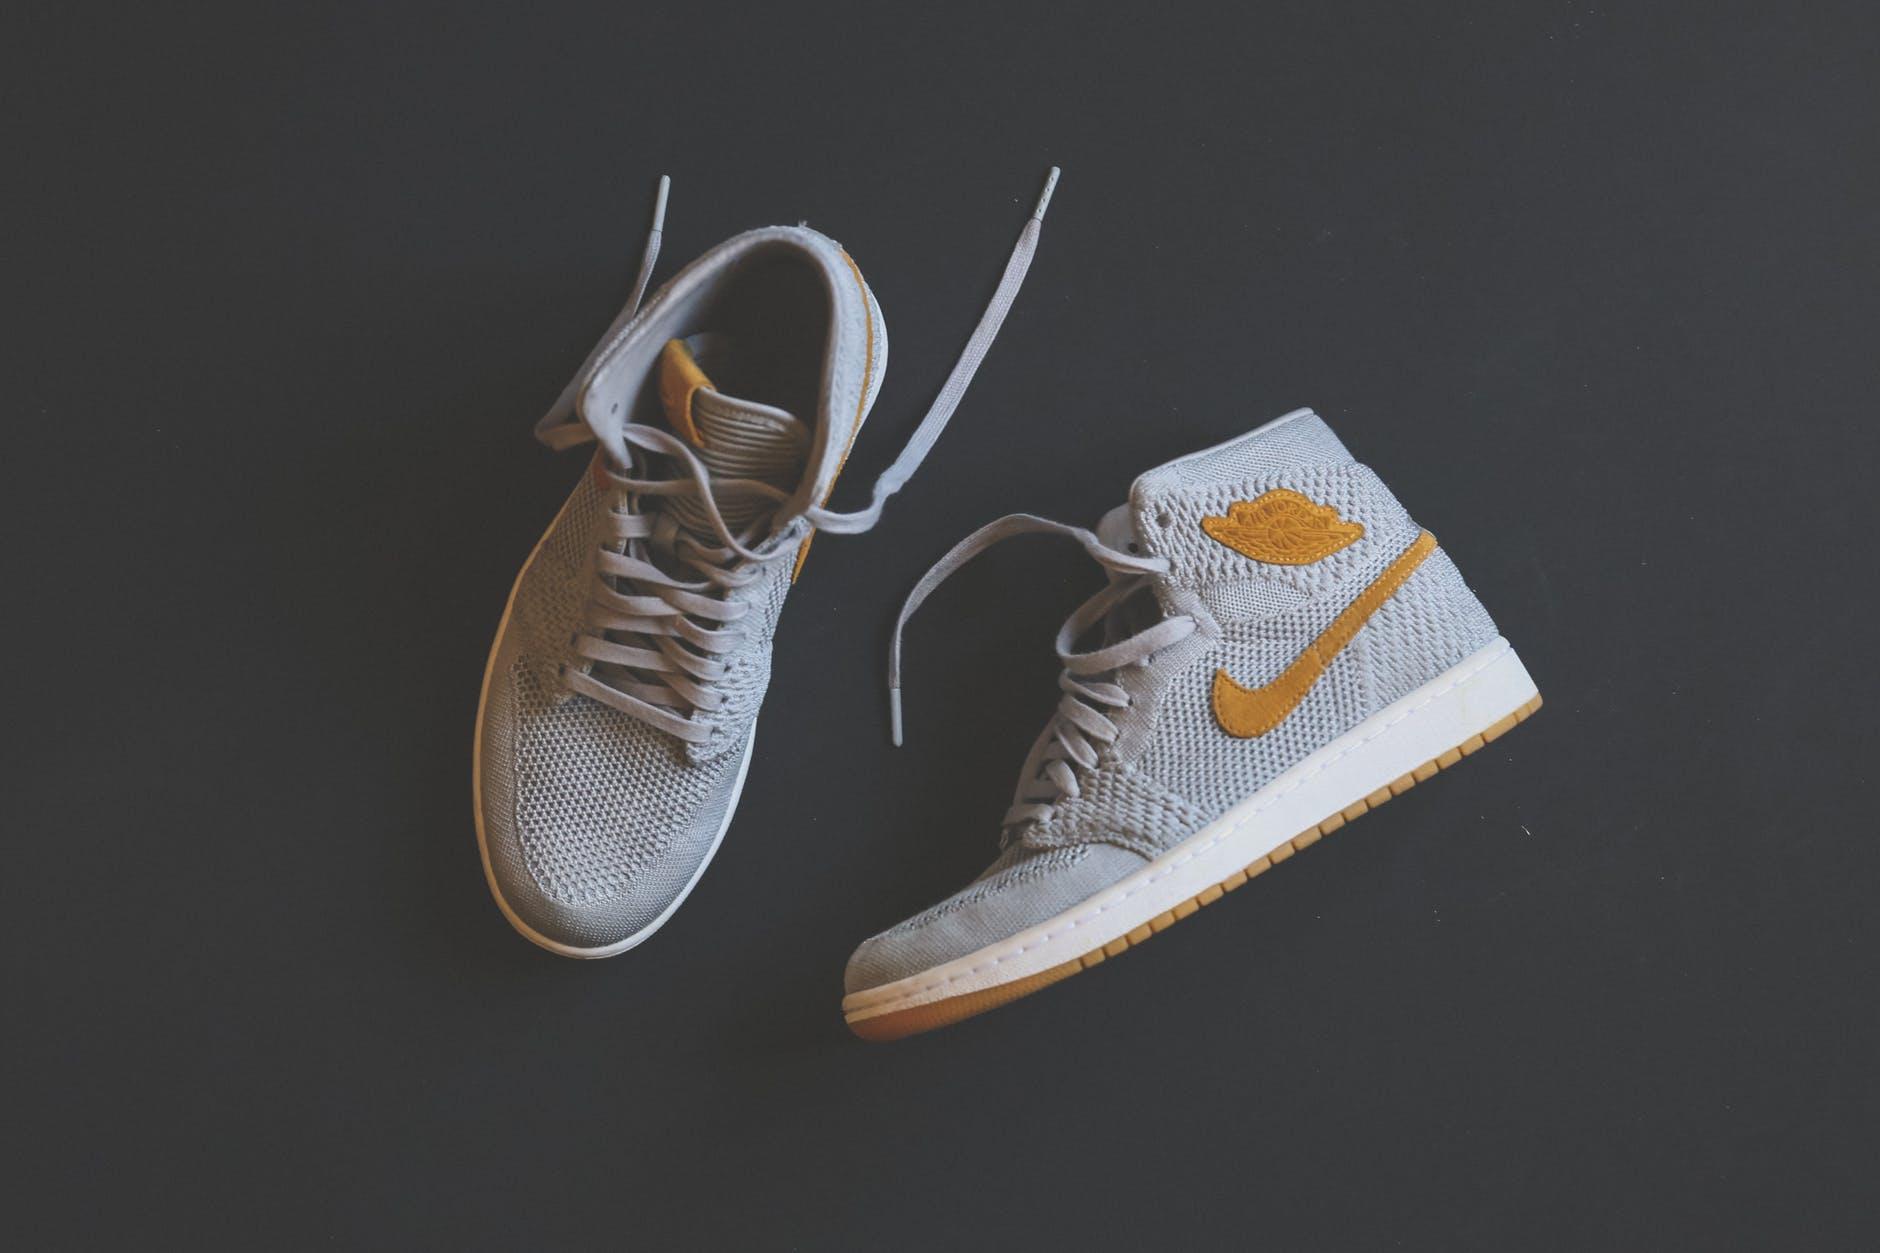 chaussure jordan grise et jaune